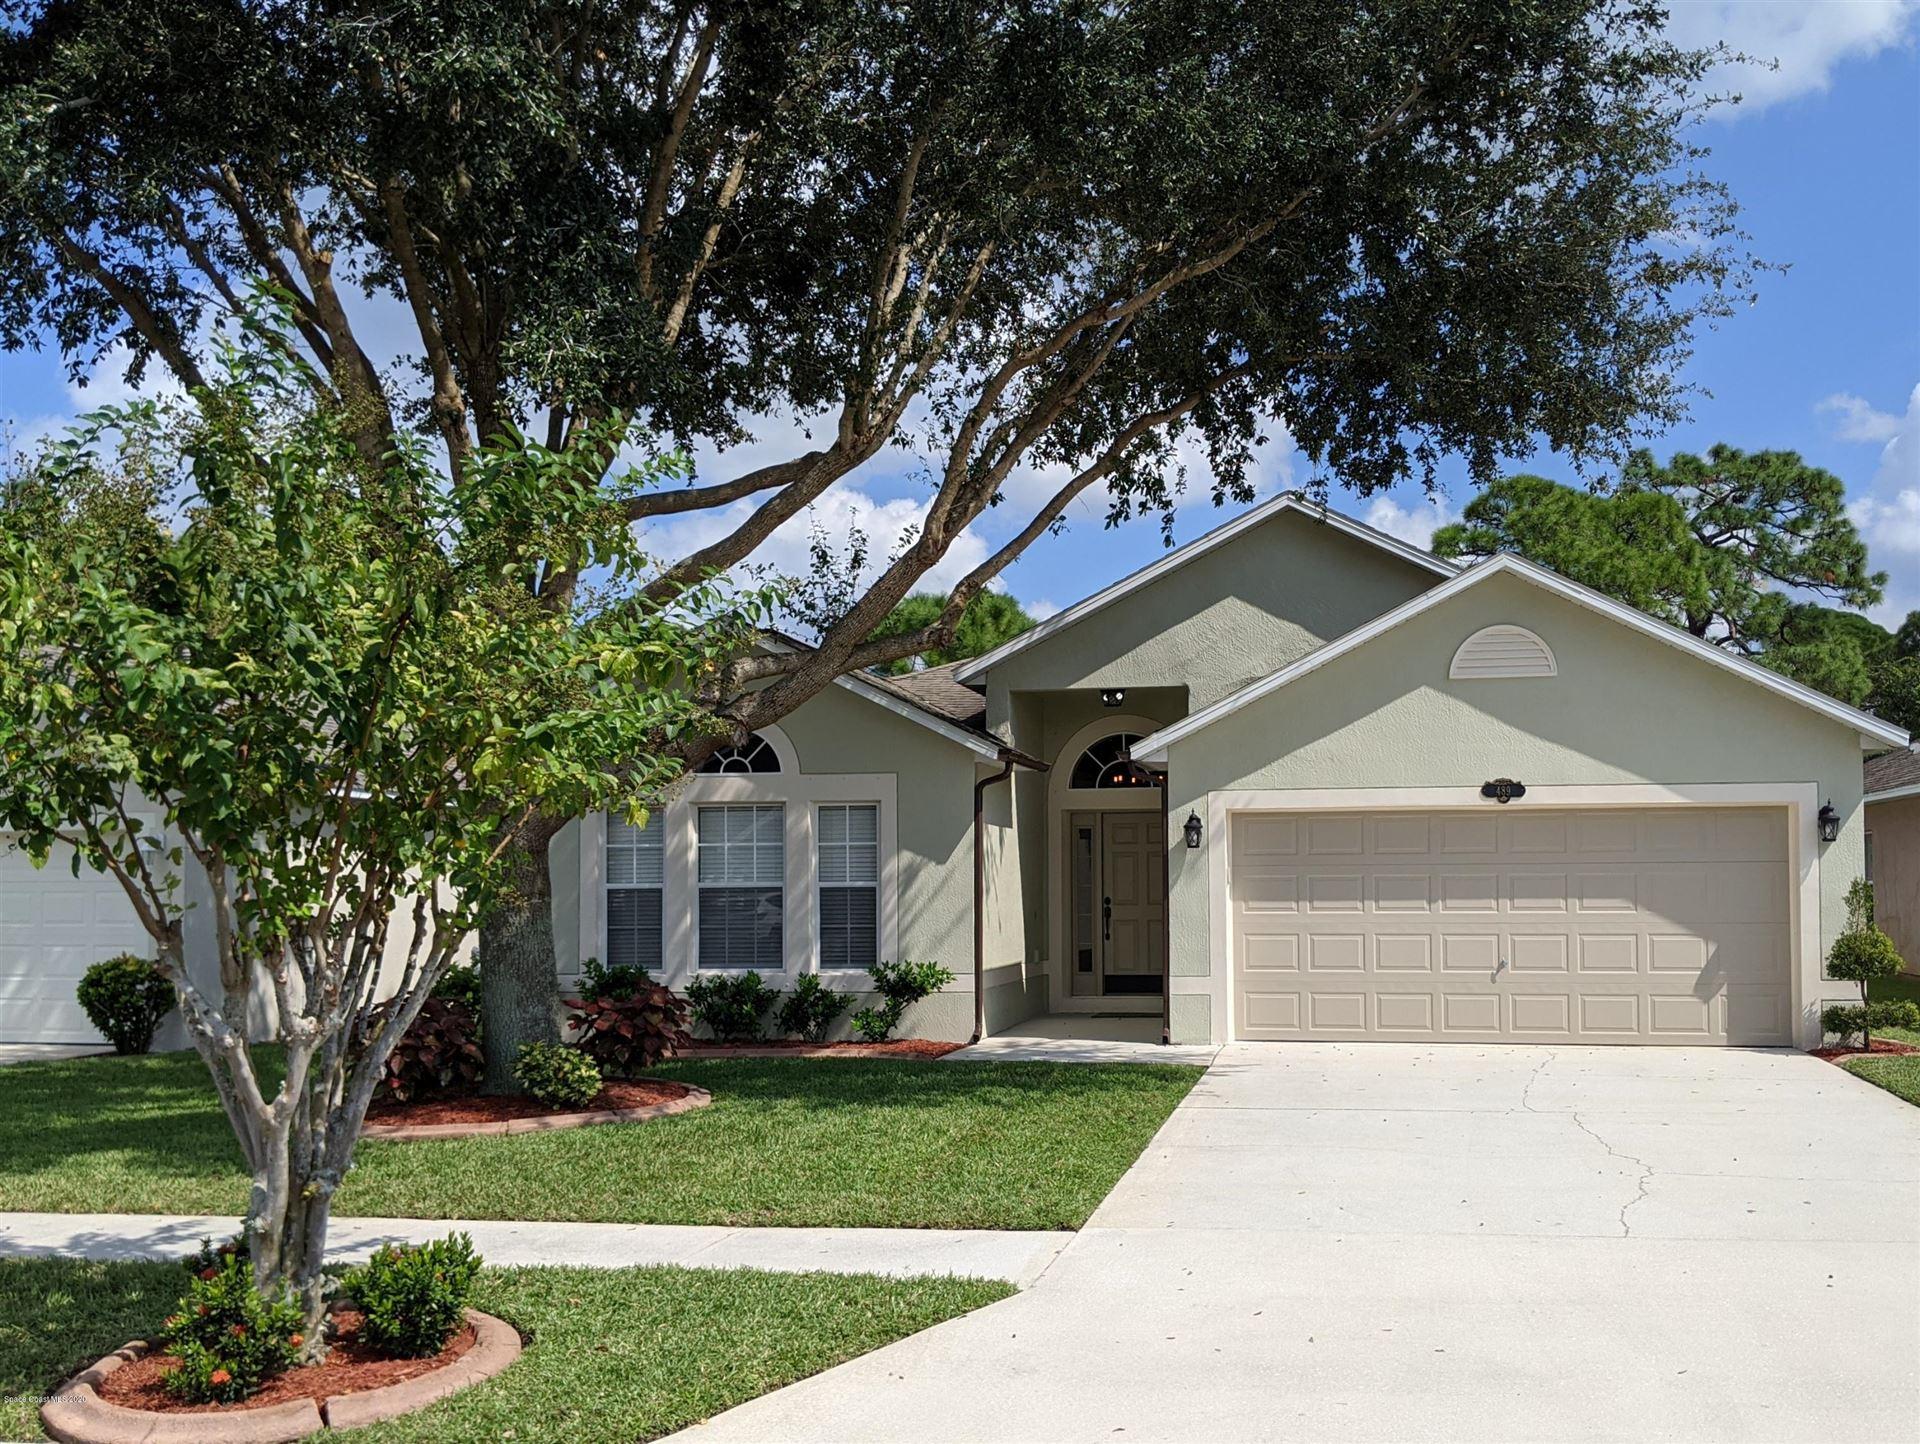 489 Macon Drive, Titusville, FL 32780 - #: 887793